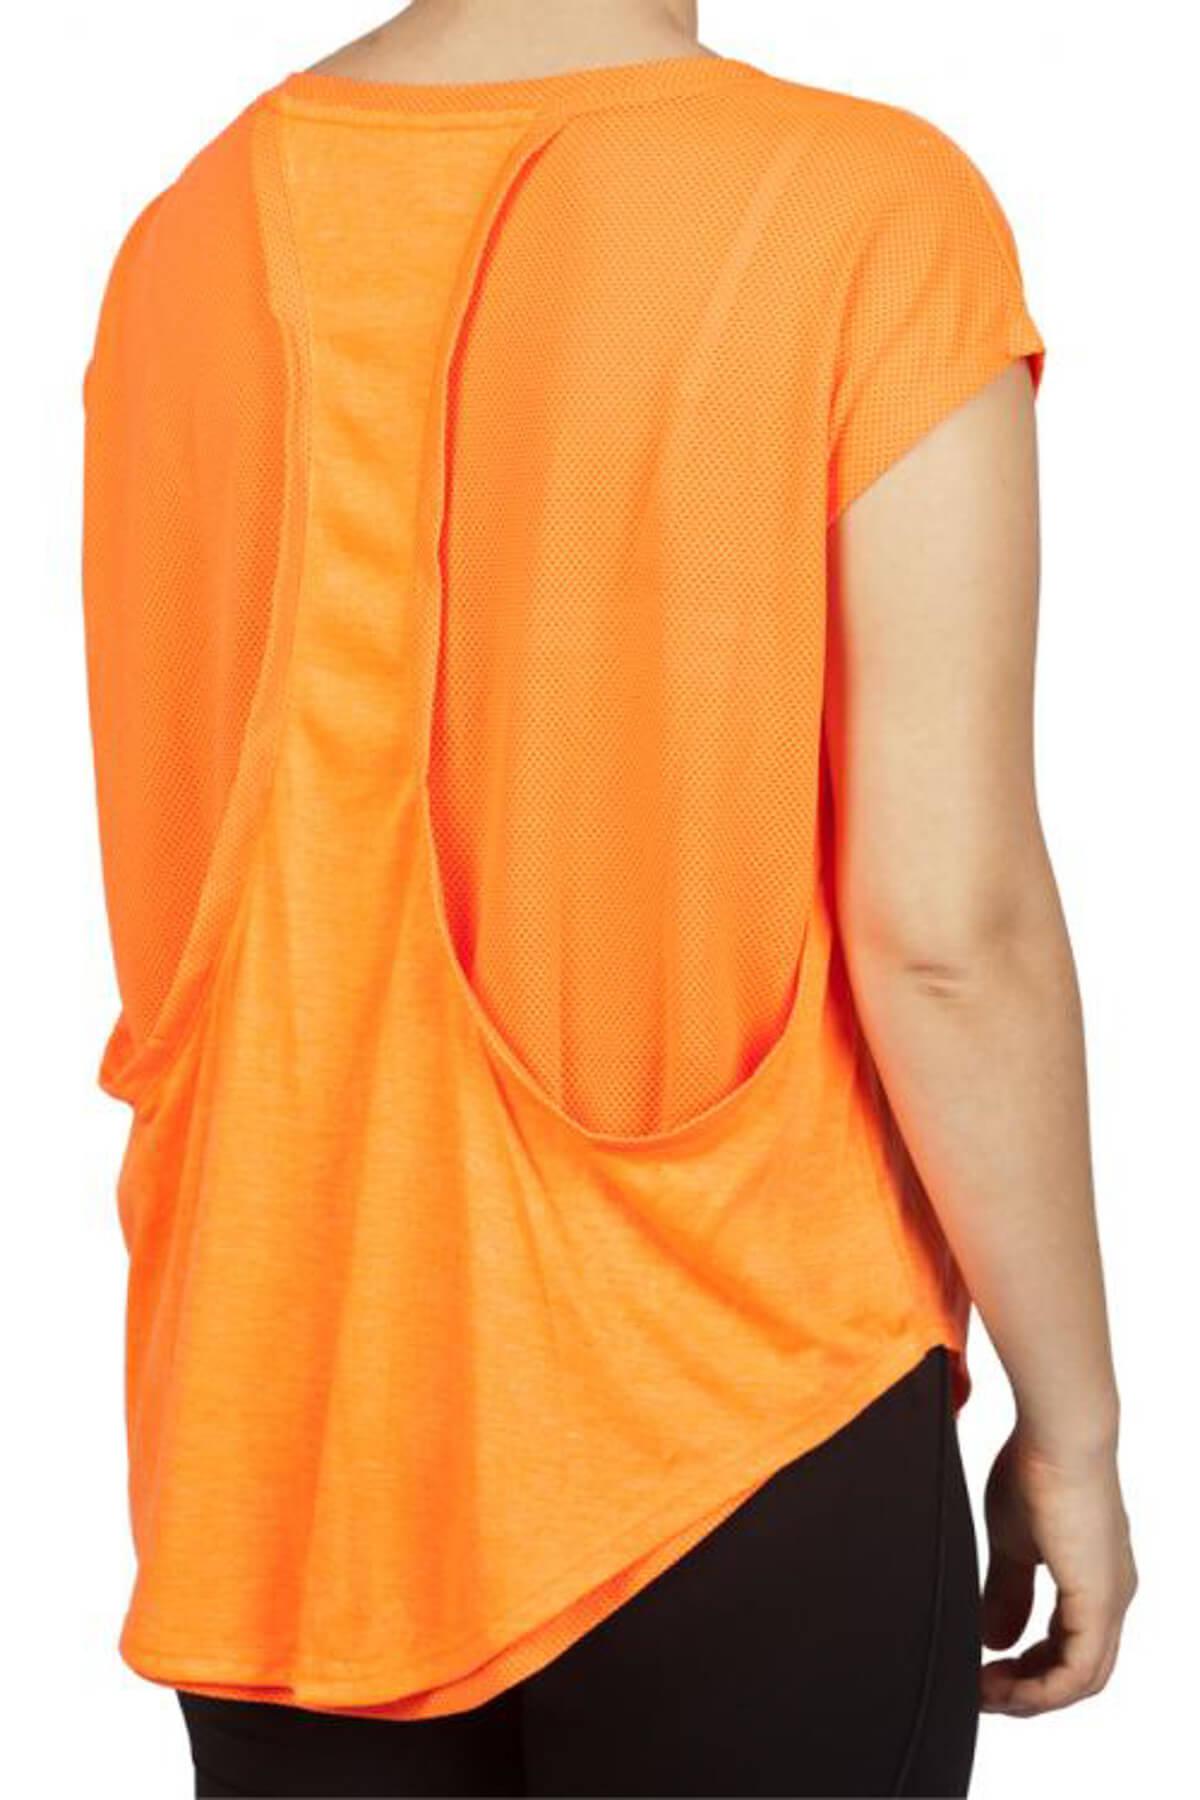 Exuma Kadın T-Shirt - Spor T-Shirt - 362203 2